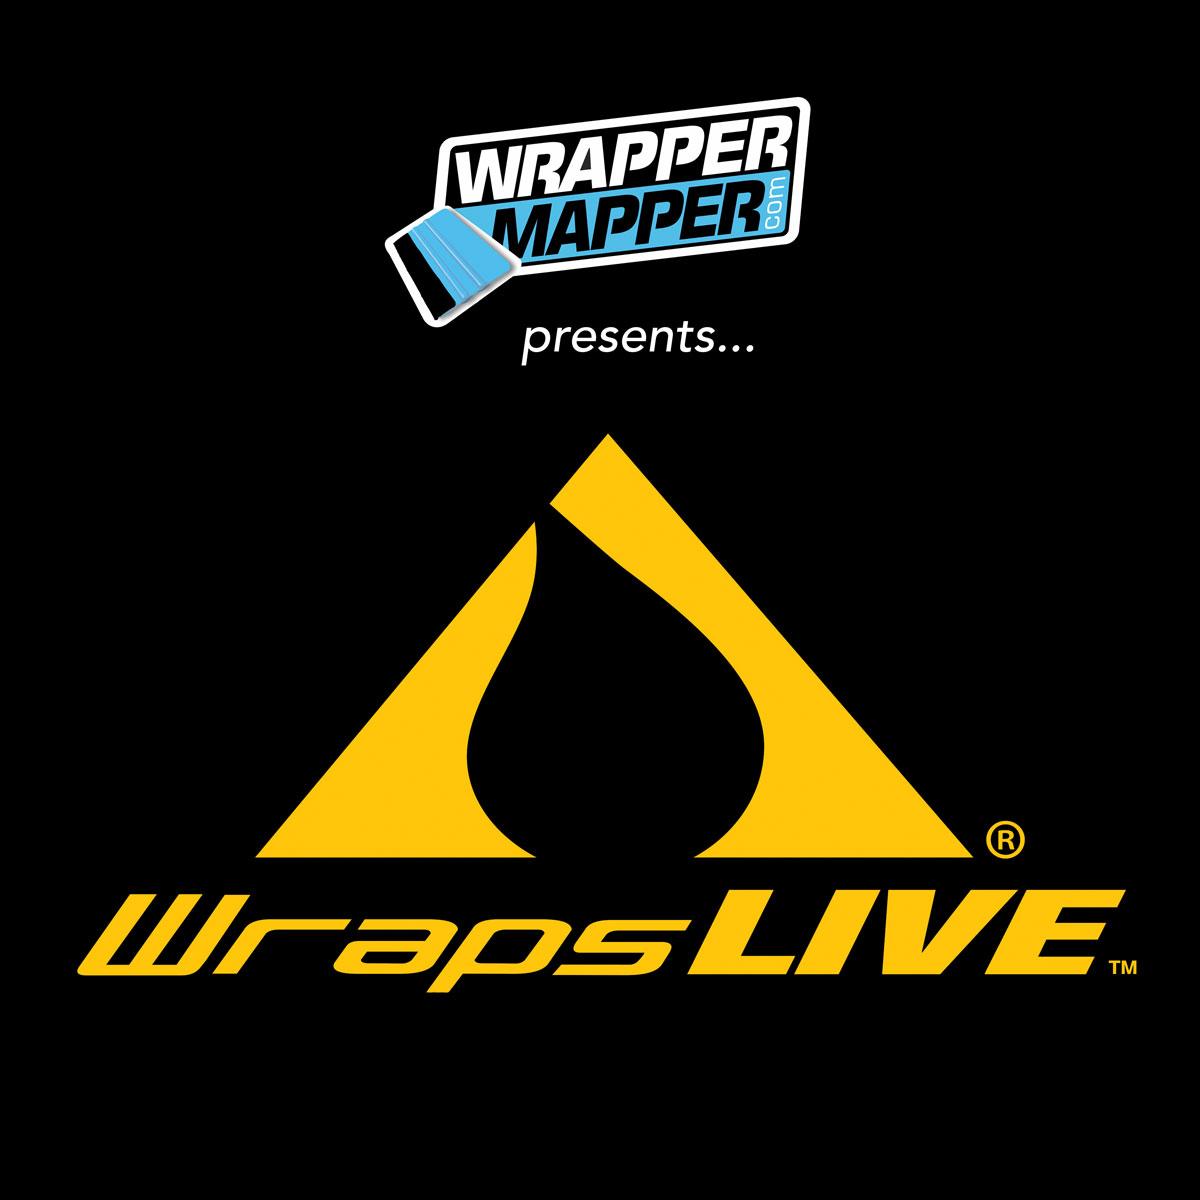 https://i0.wp.com/www.wrapslive.com/wp-content/uploads/2019/01/WrapsLIVE_WrapperMapper_presents_Square_FINAL_2018_1200.jpg?fit=1200%2C1200